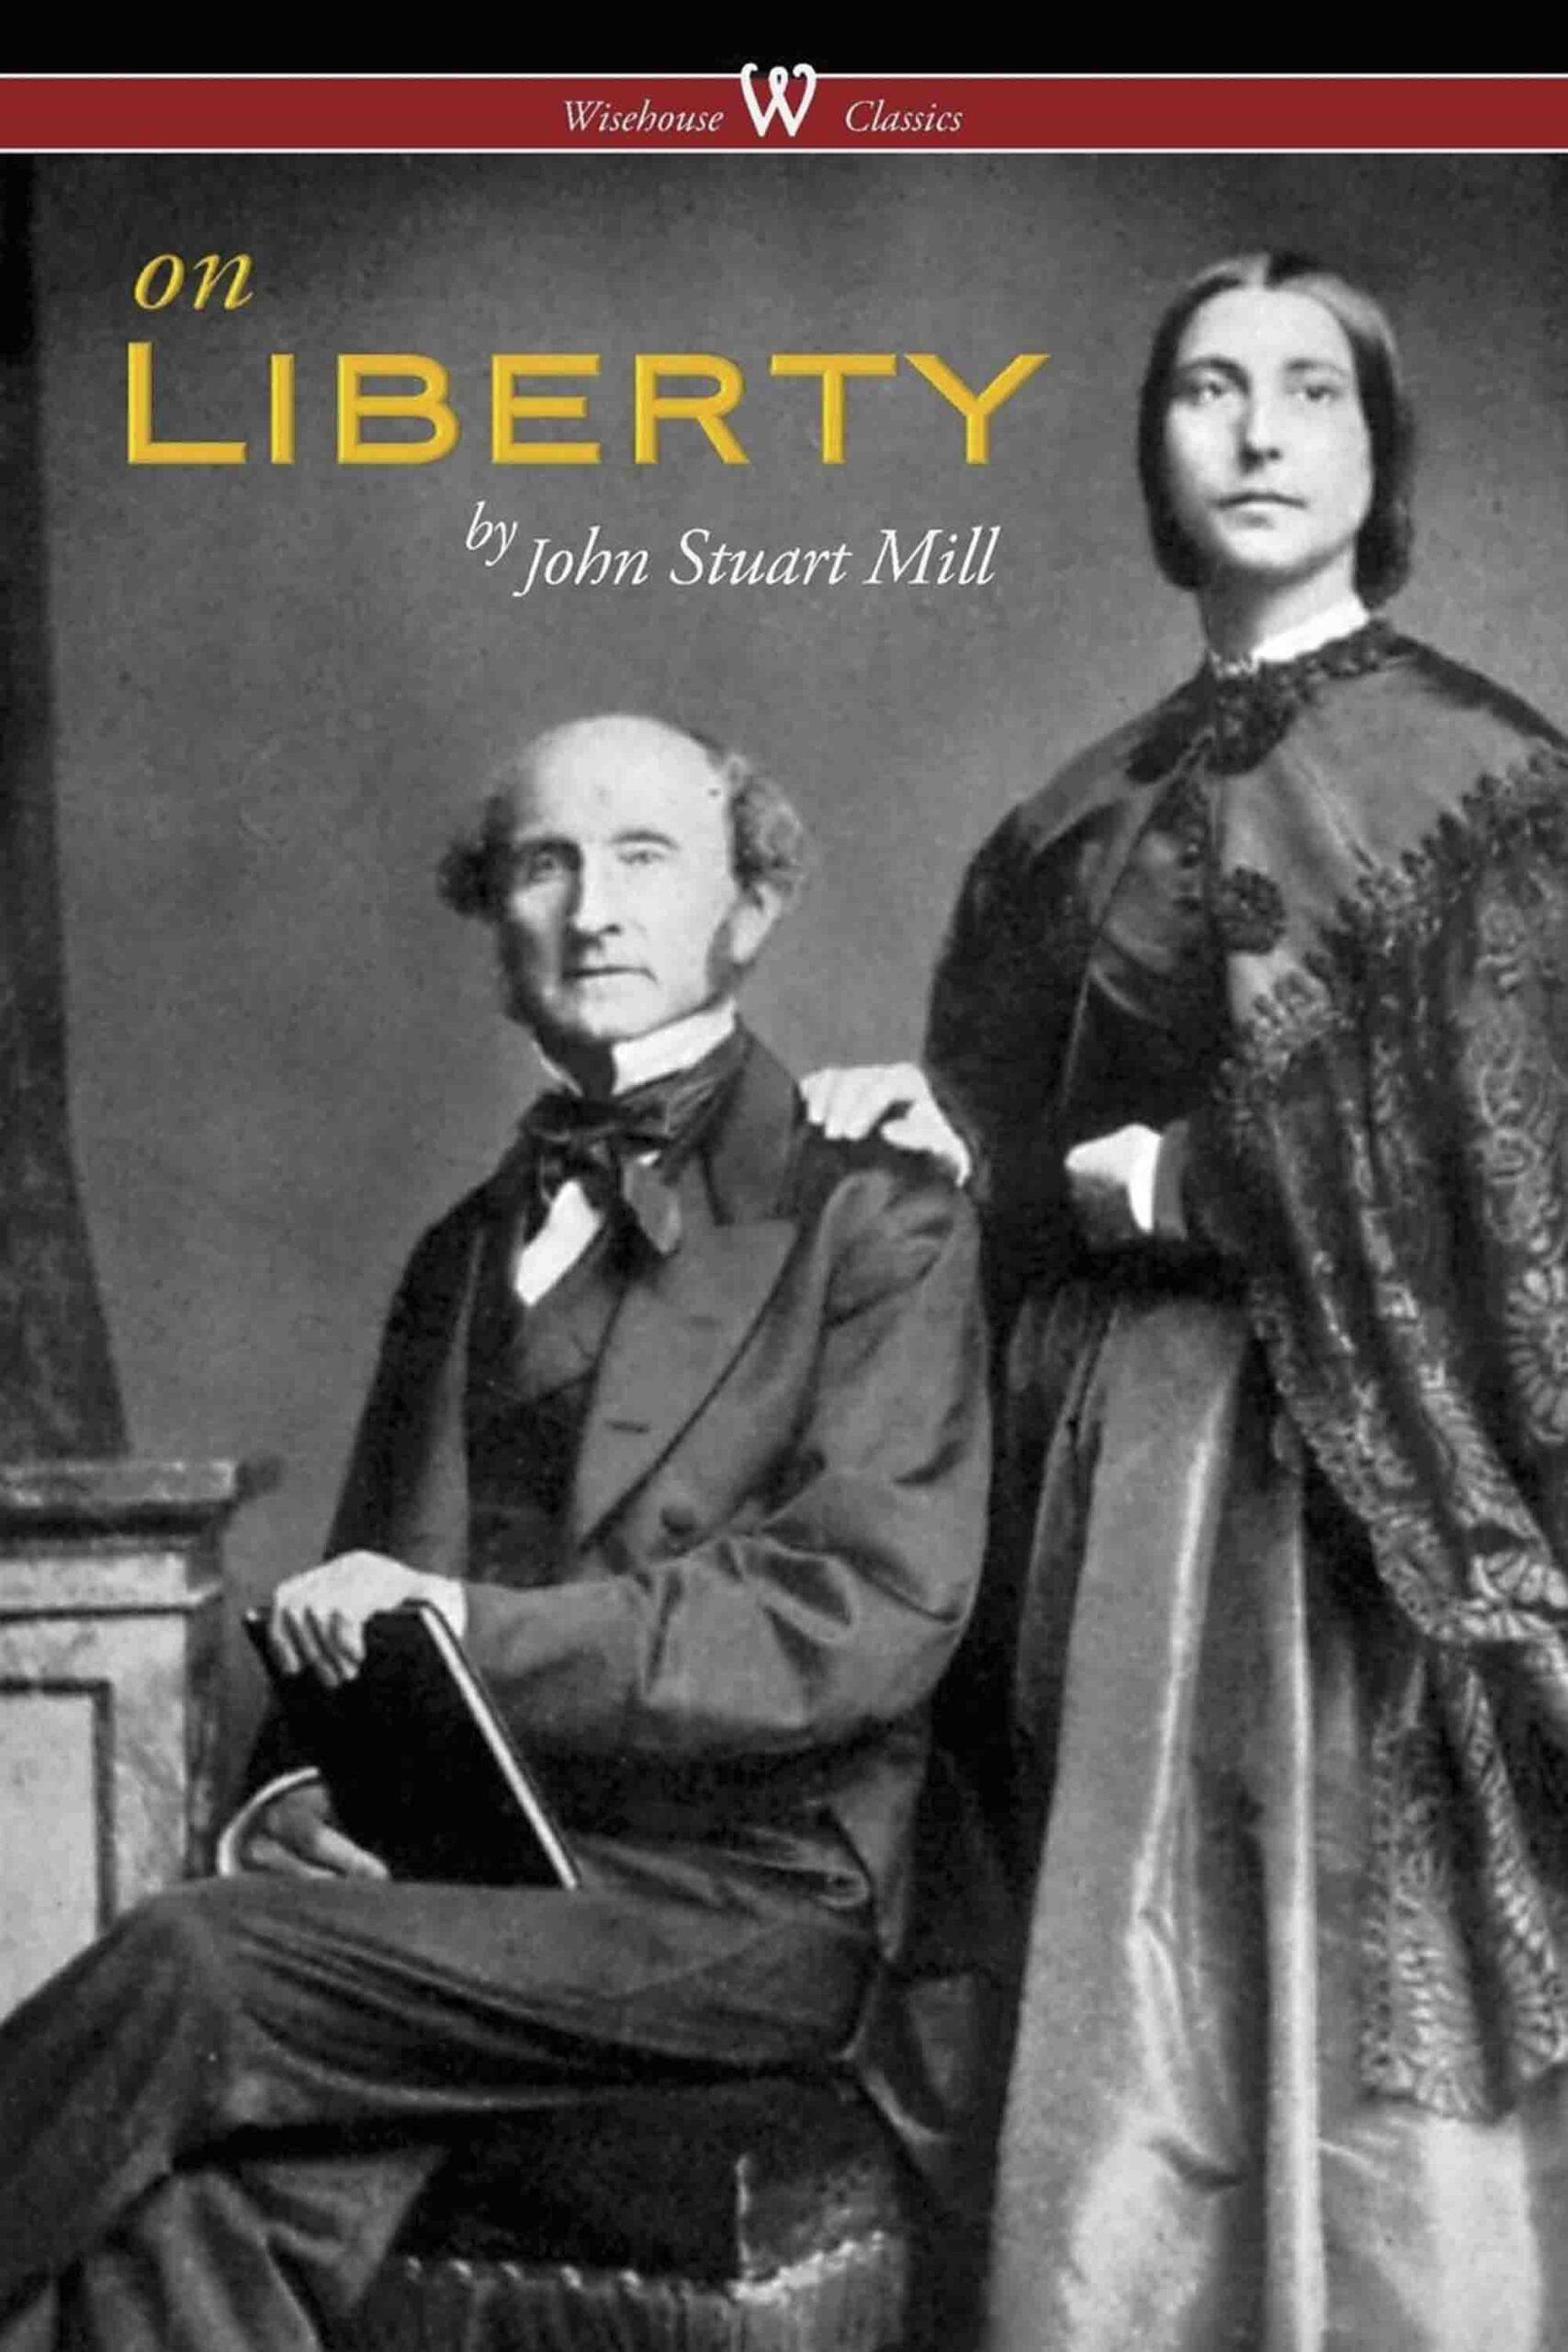 On Liberty (Wisehouse Classics – The Authoritative Harvard Edition 1909)